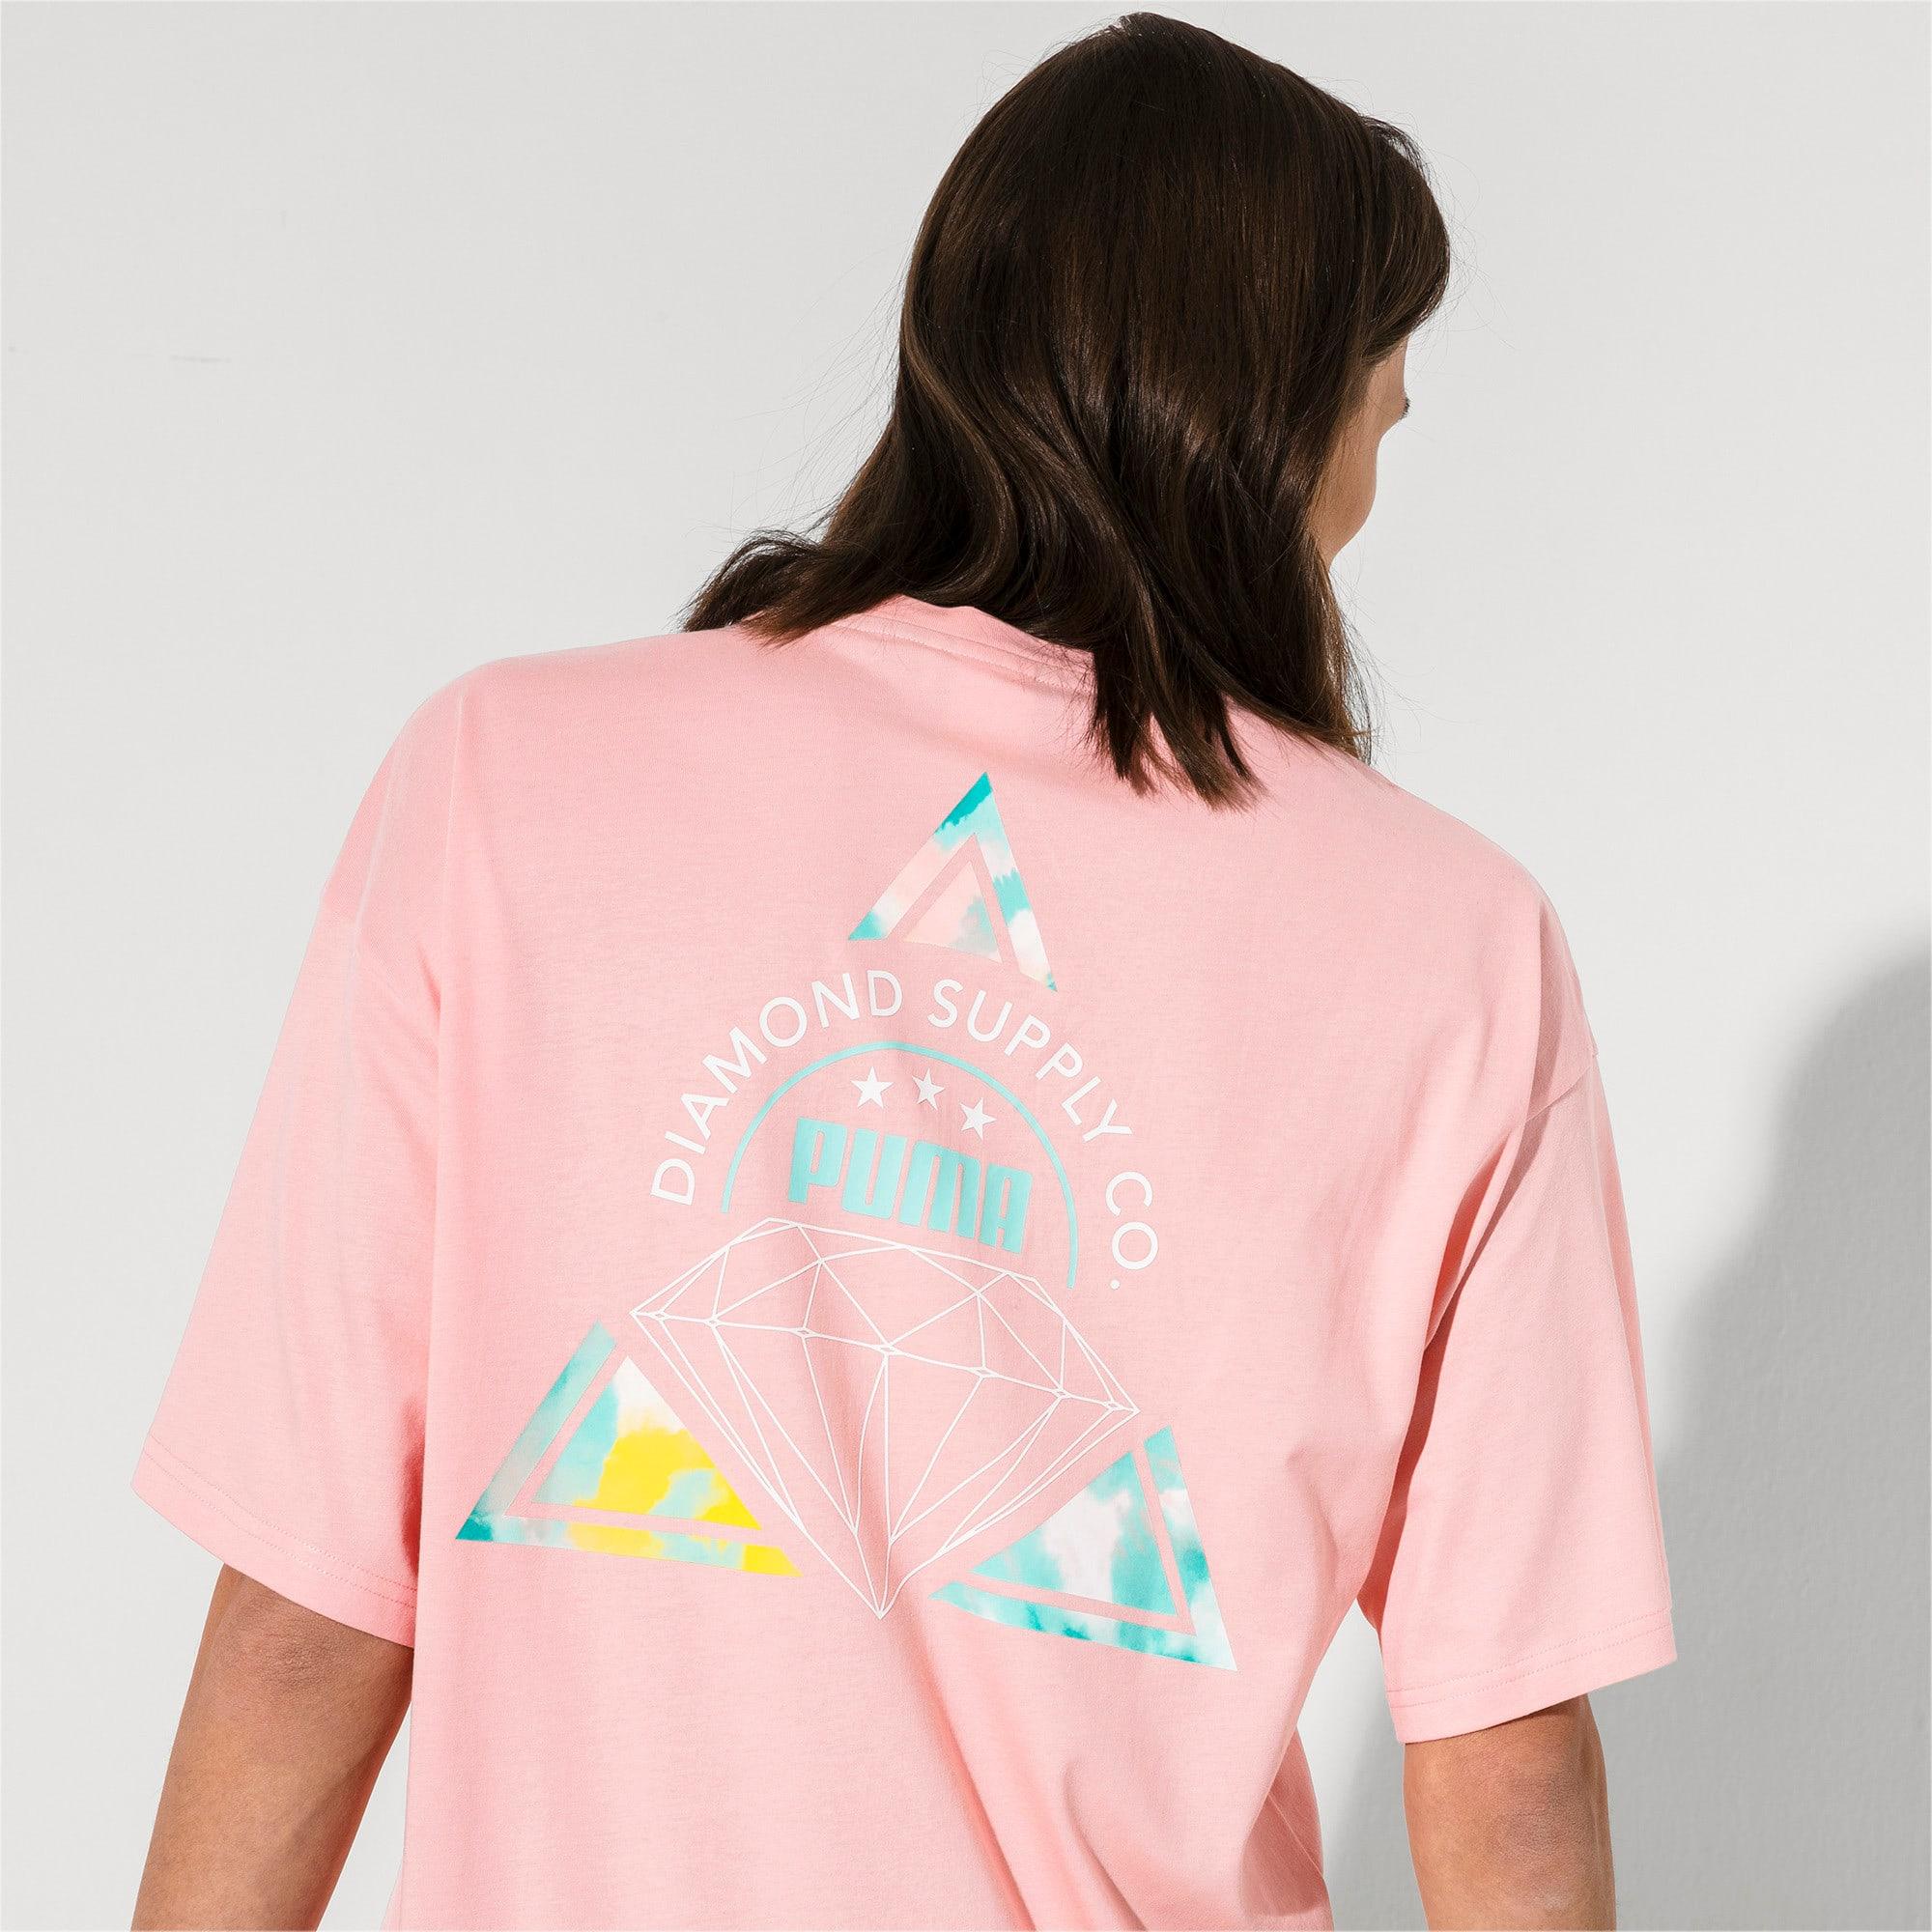 Thumbnail 3 of PUMA x DIAMOND T-shirt met korte mouwen voor heren, Peach Bud, medium